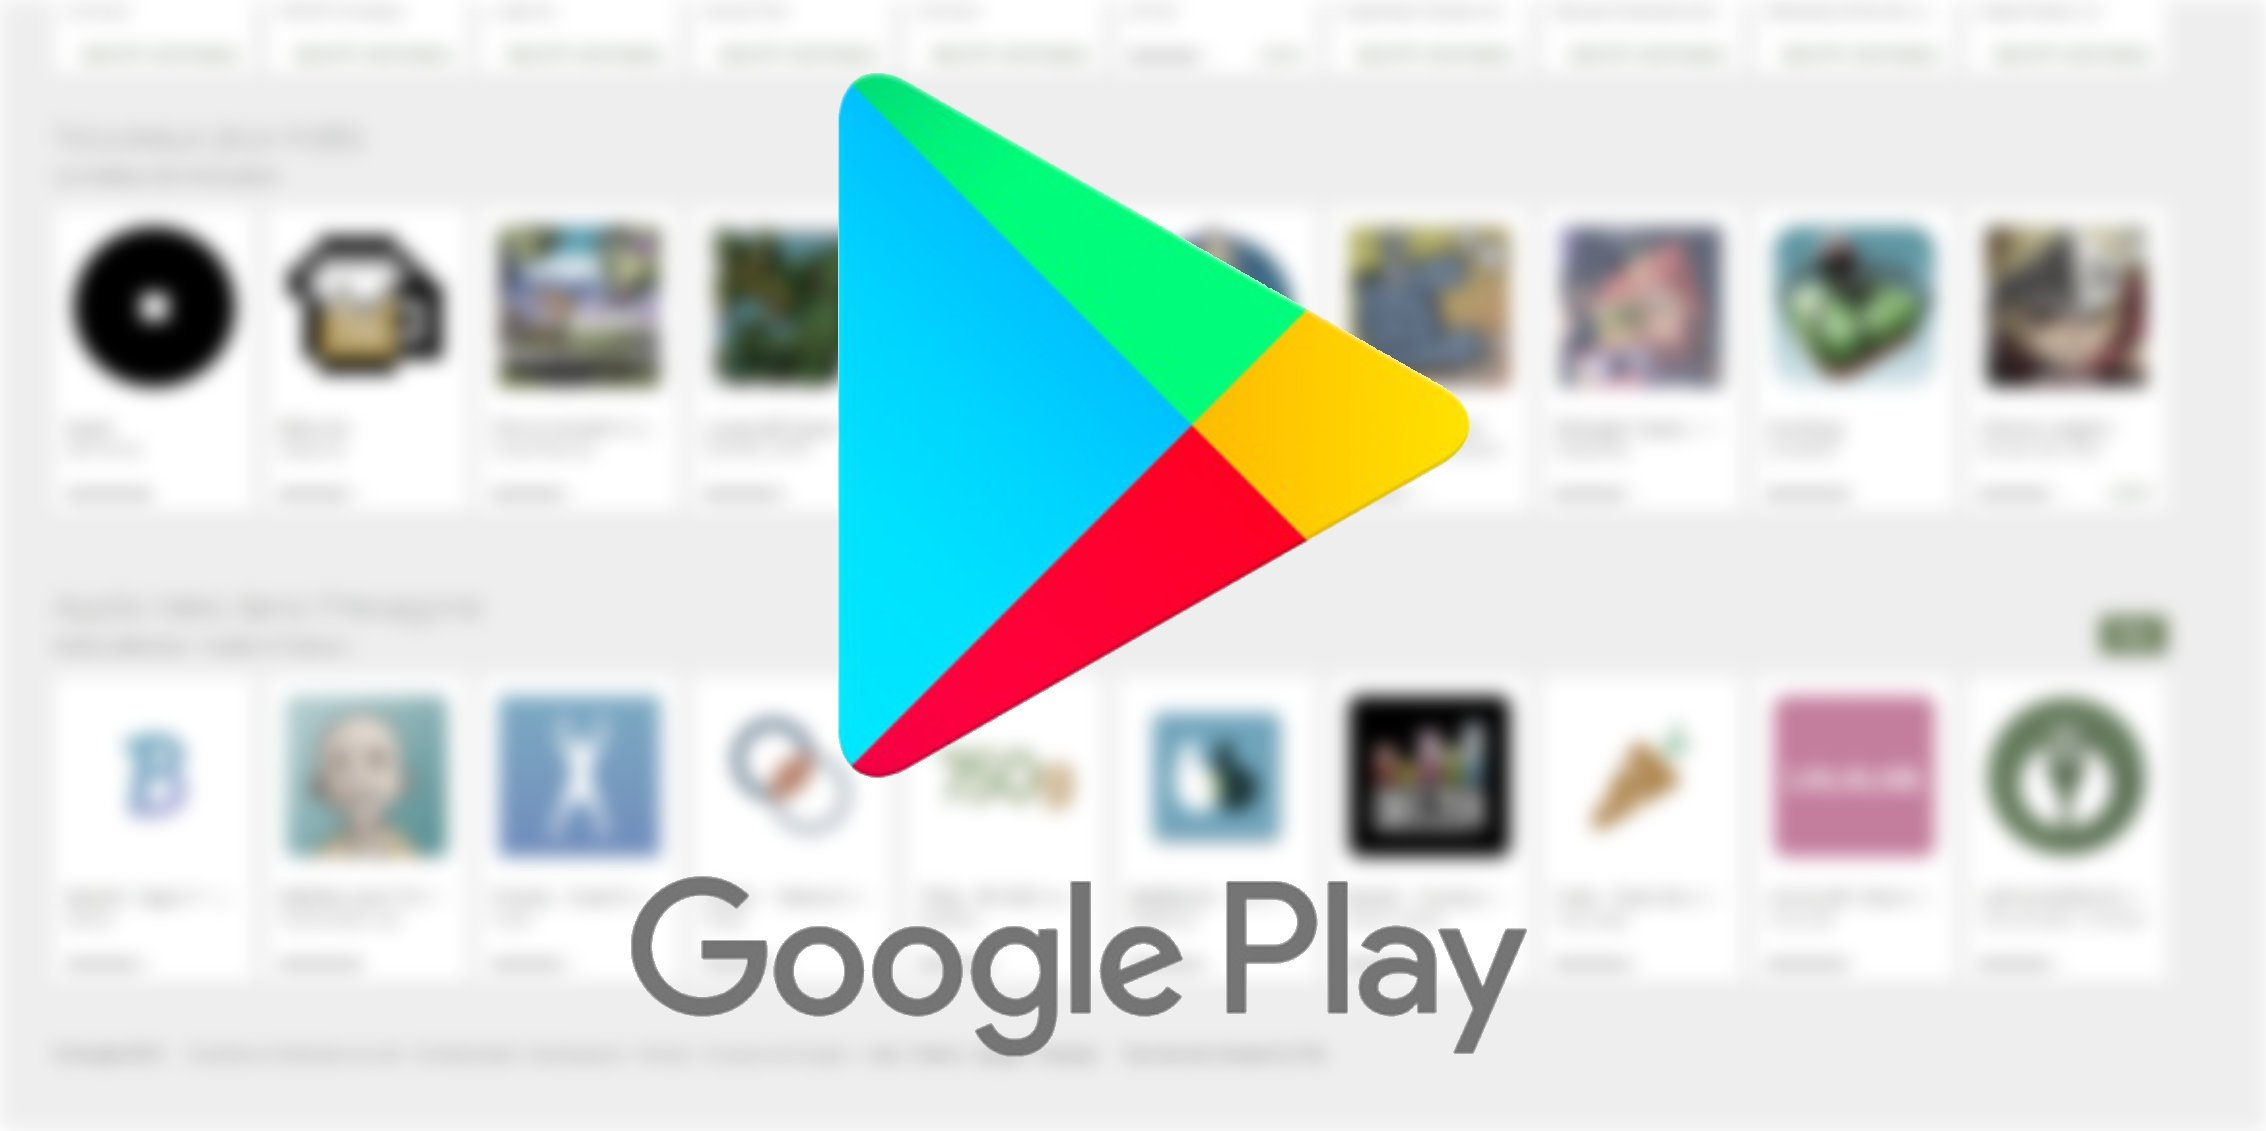 Google Play: Les revenus trimestriels ont bondi à 21,5 milliards de dollars